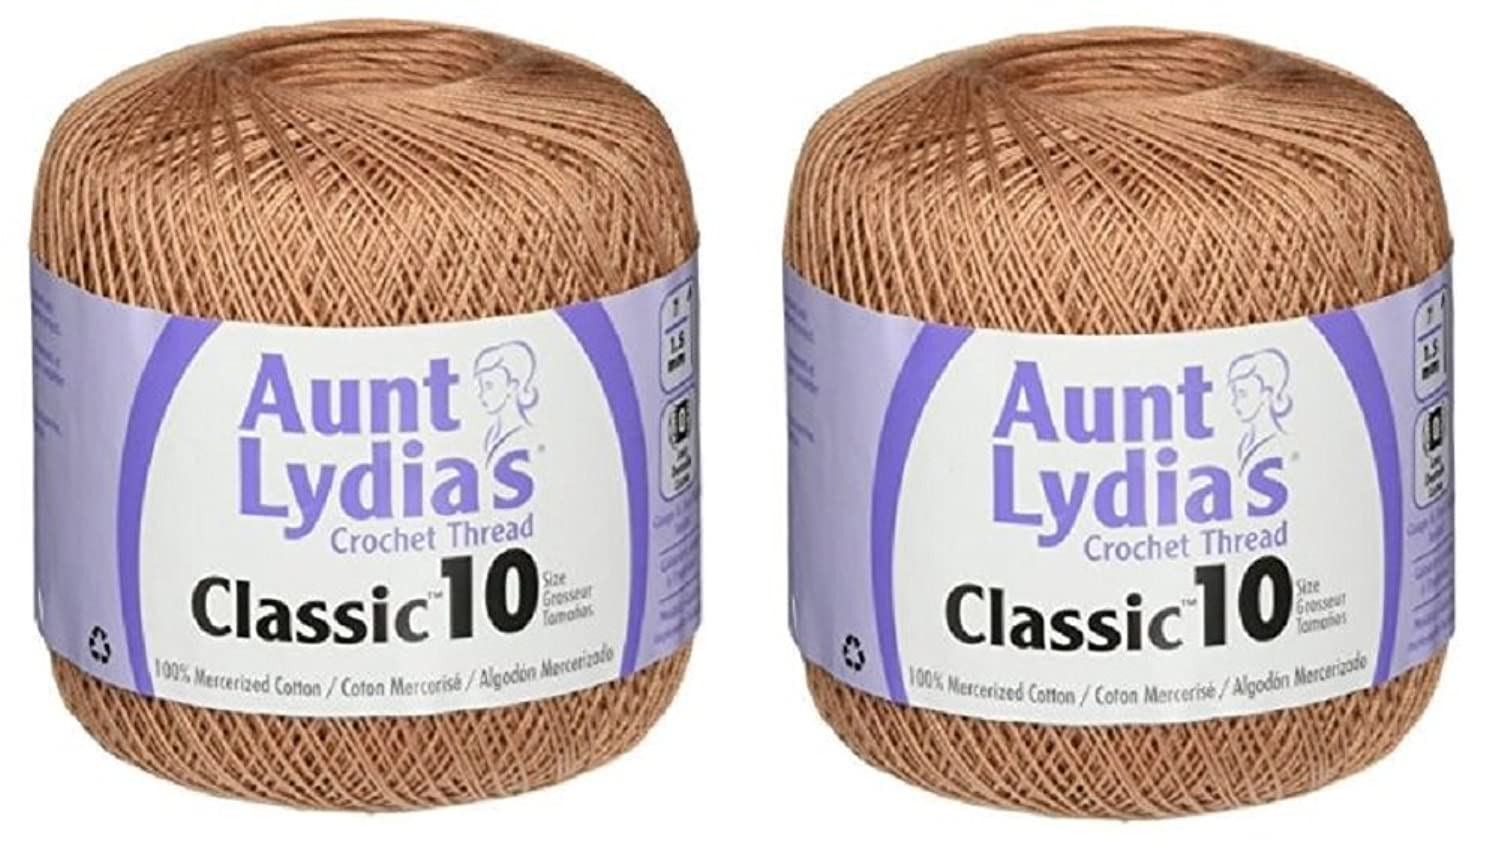 Aunt Lydia's Crochet Thread - Size 10 - Copper Mist (2-Pack)